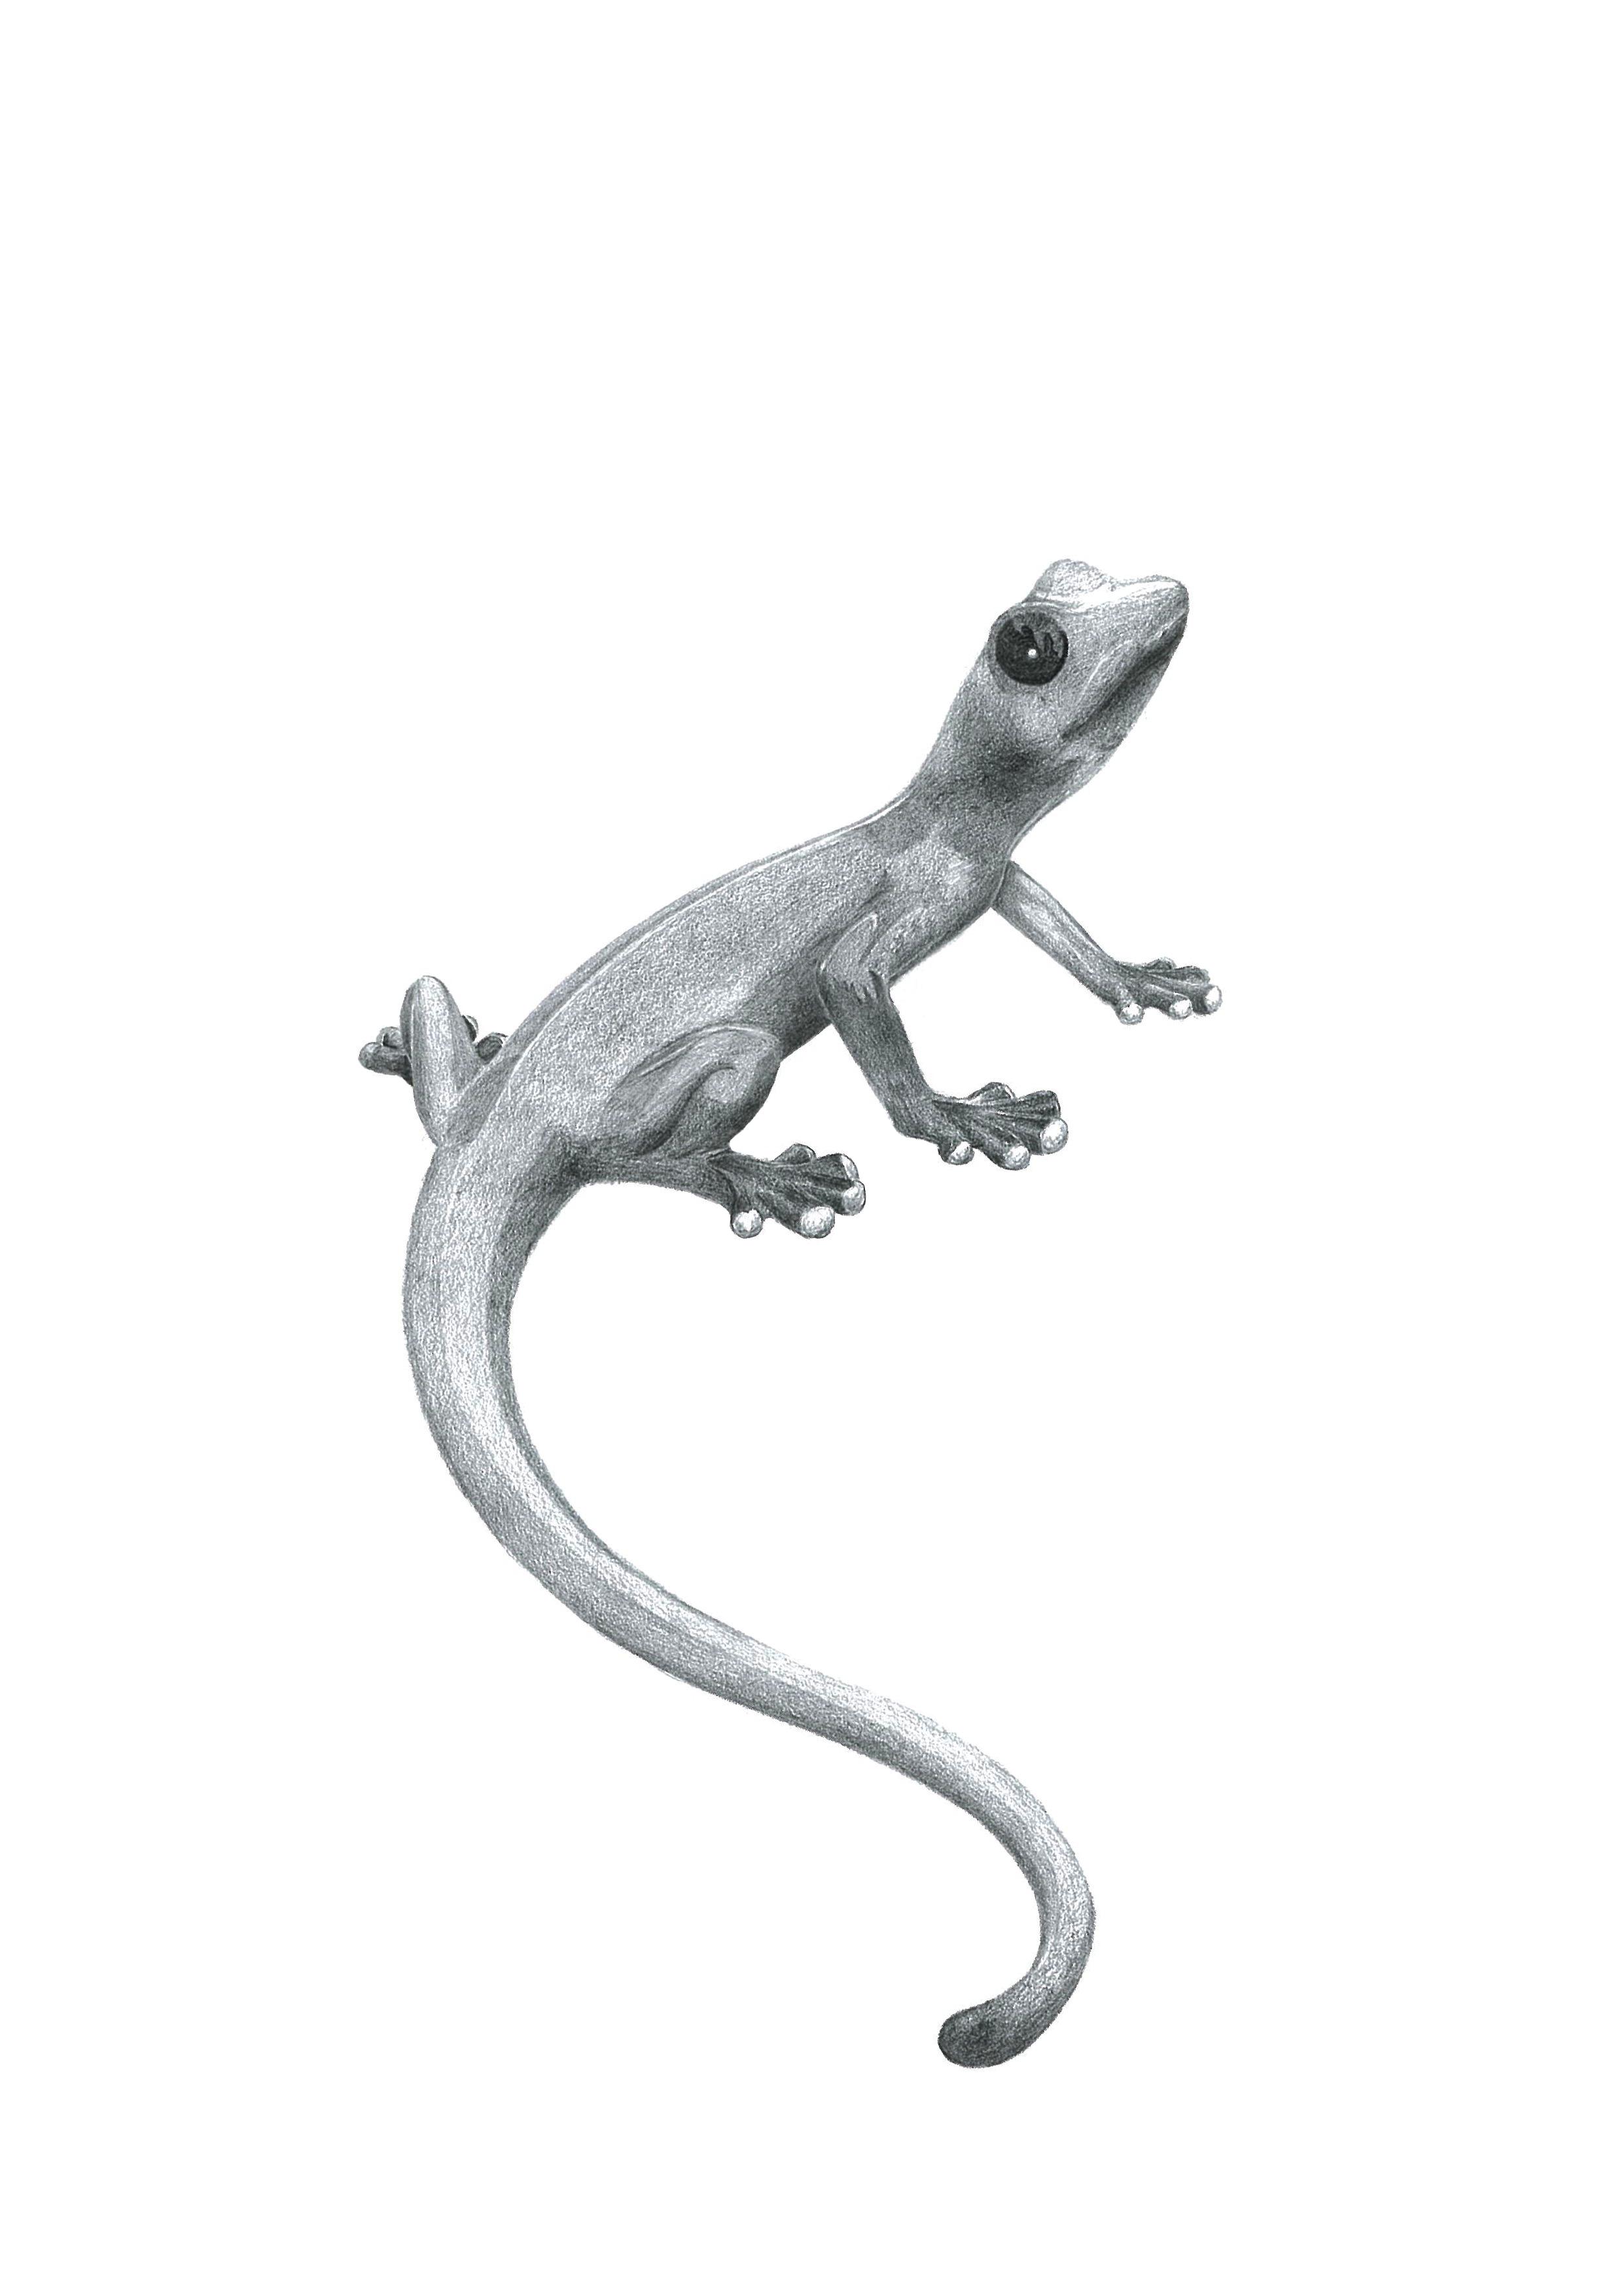 House Lizard PNG - 45583